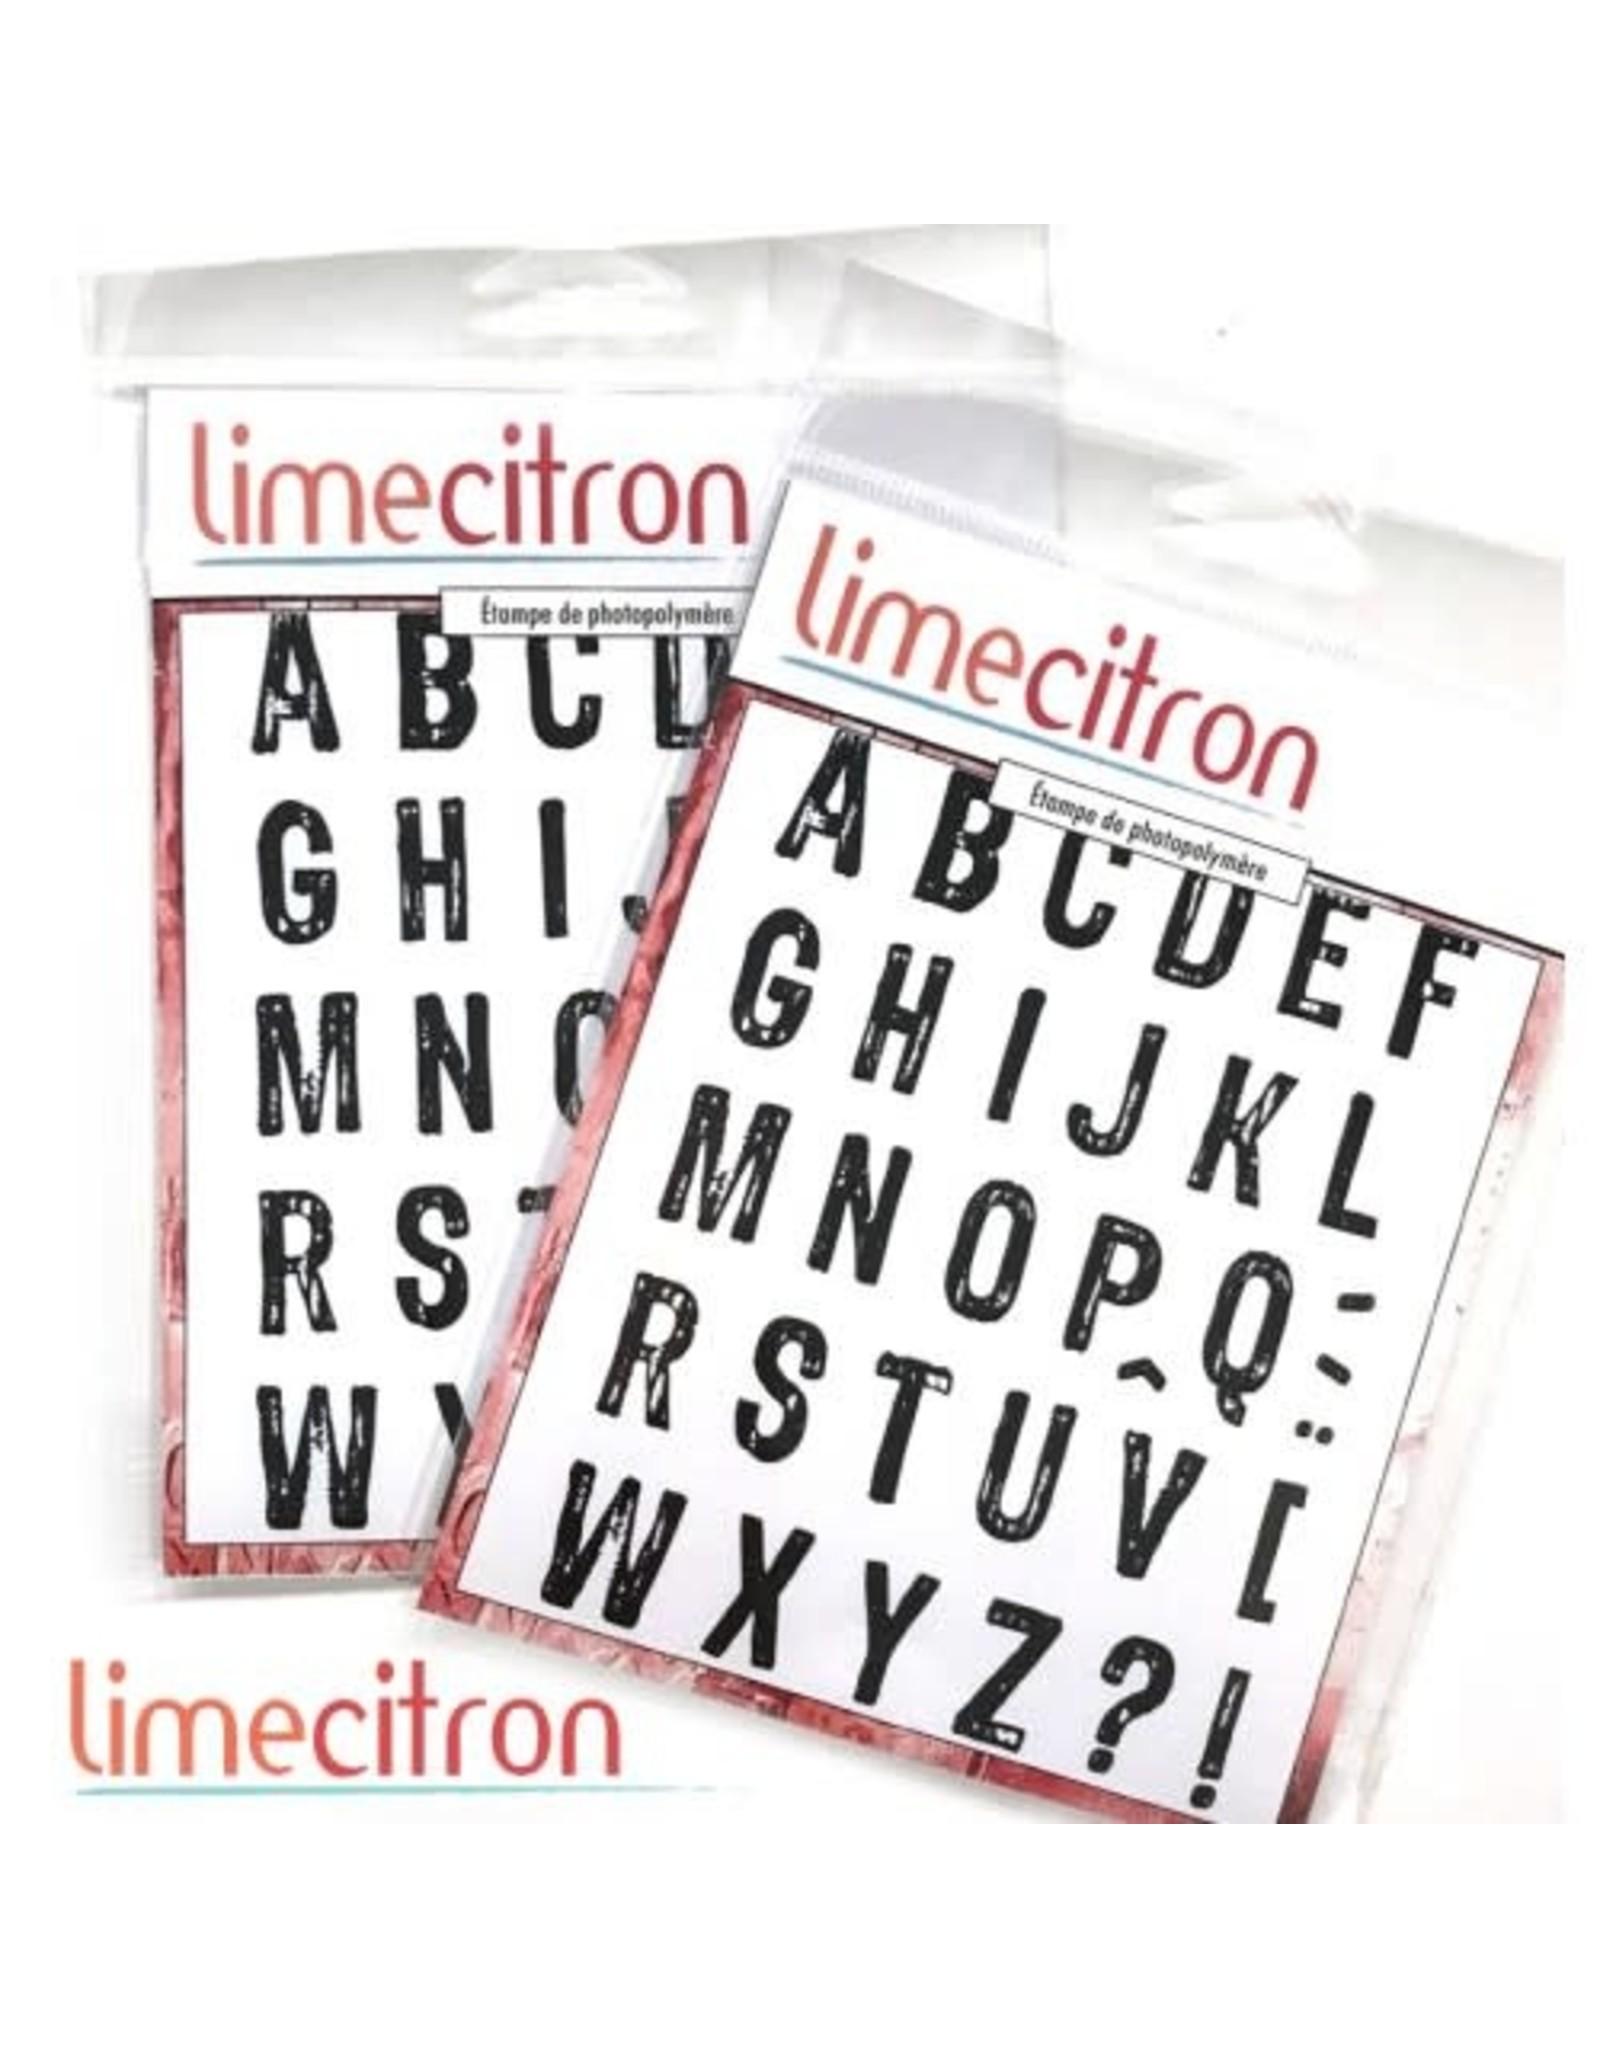 Limecitron Alphabet massif Stamp